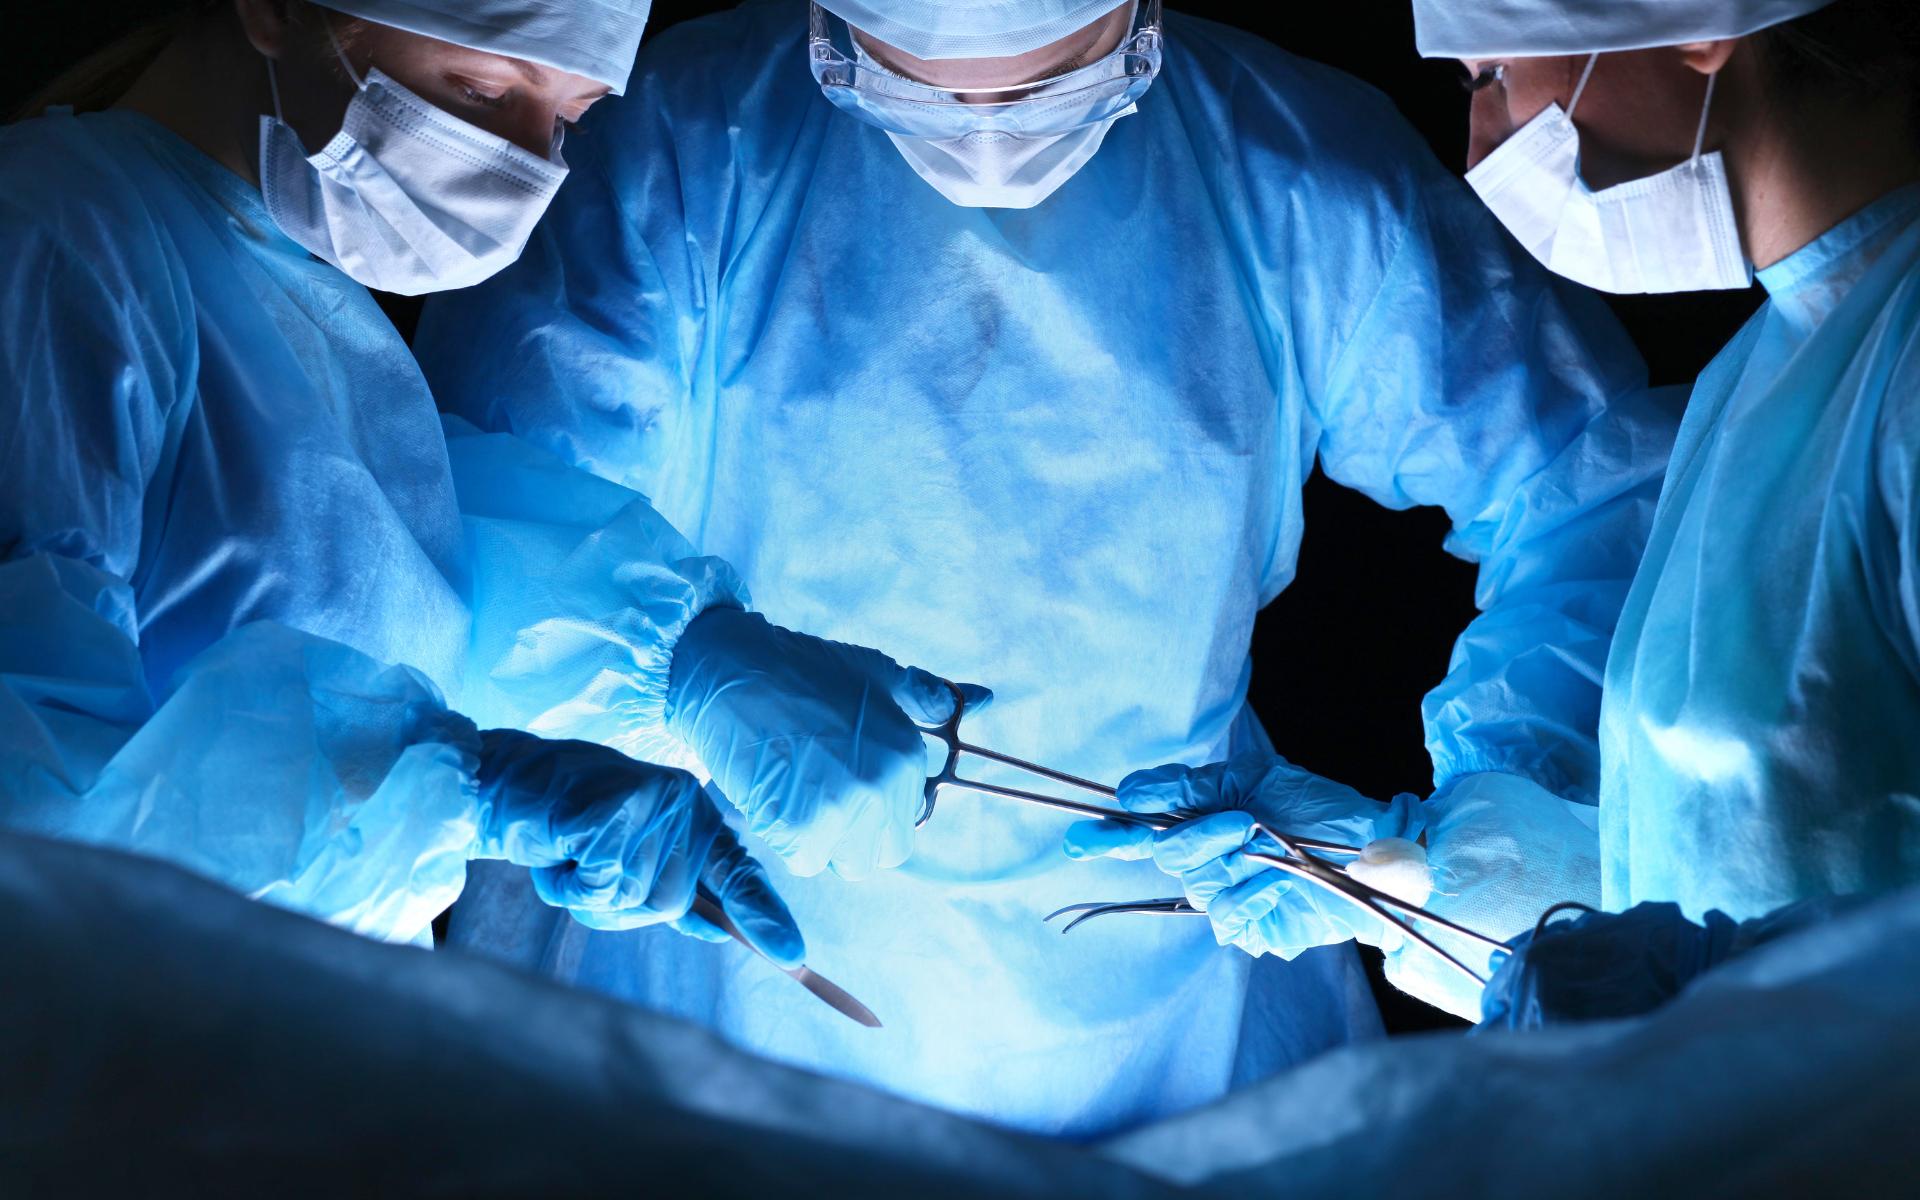 role-chirurgien-orthopediste